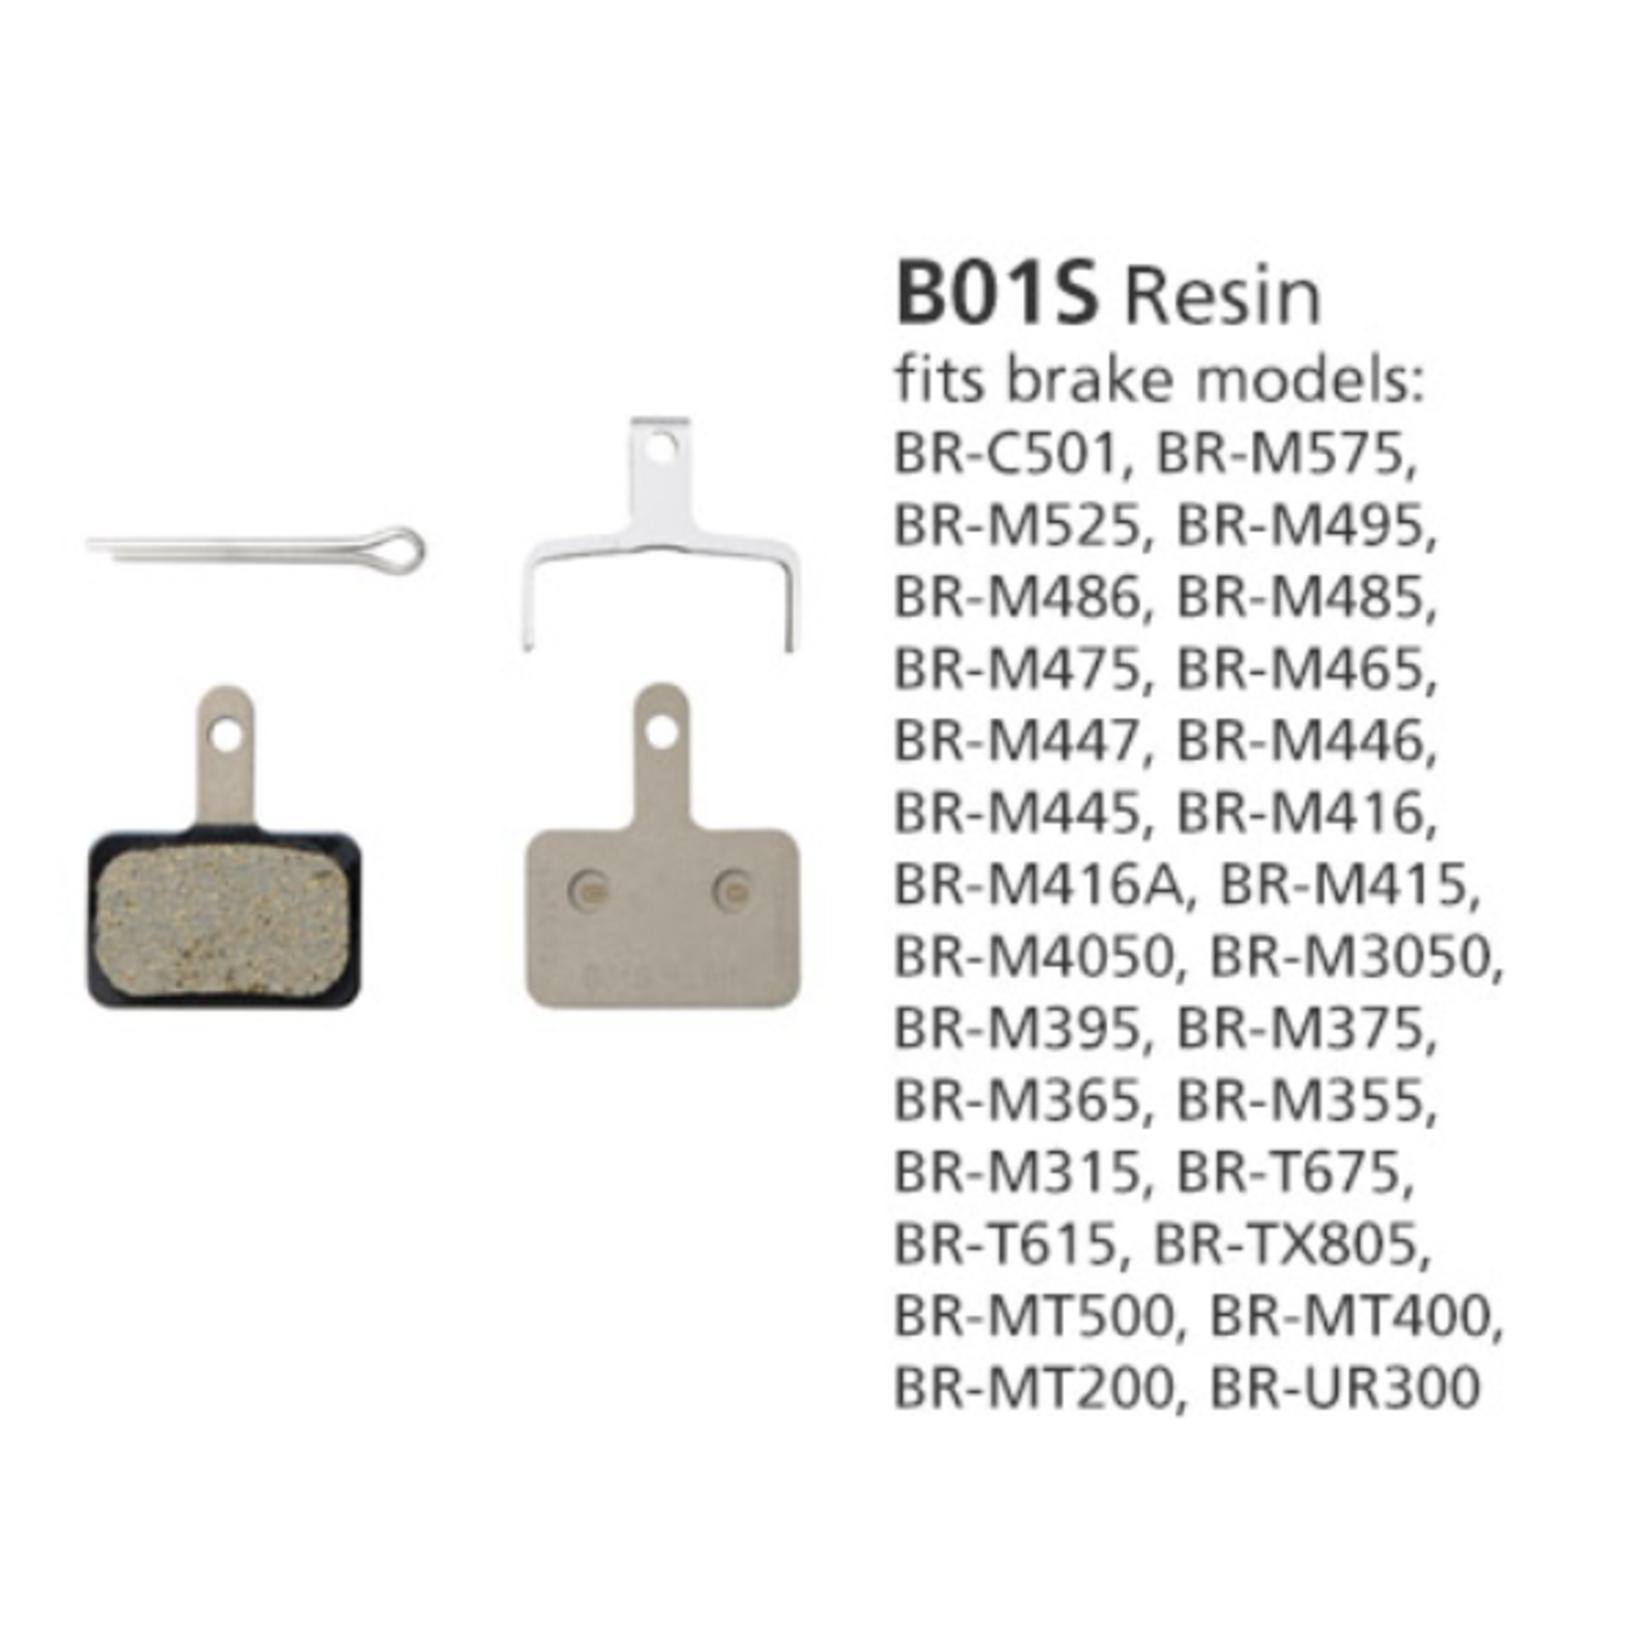 Shimano BR-MT400 B01S Resin Disc Pads